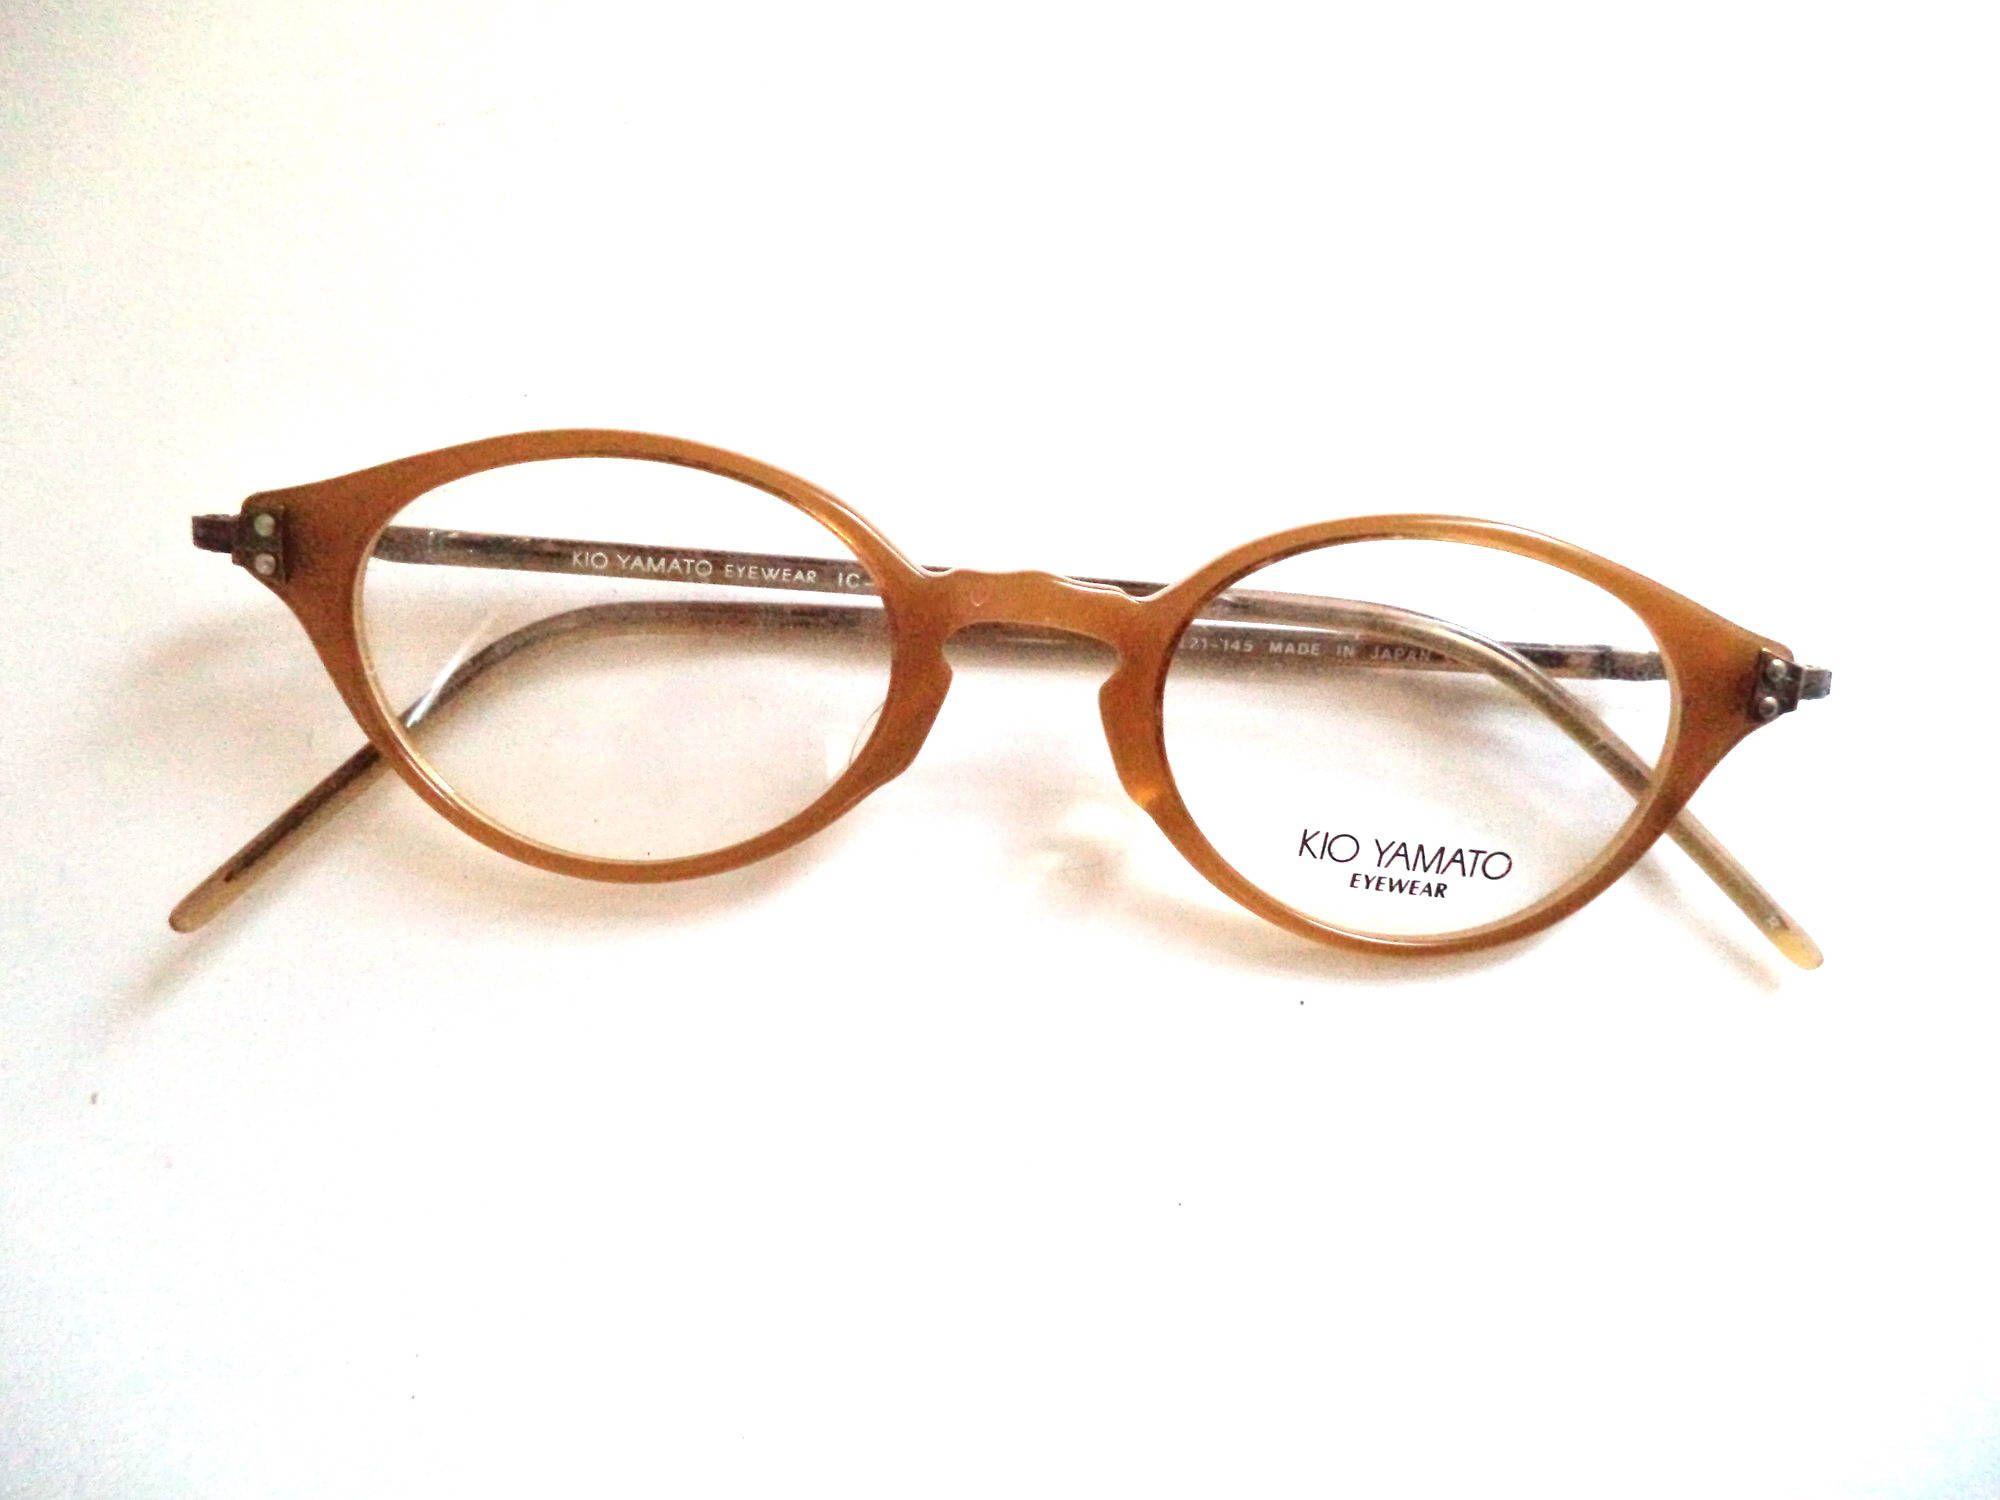 a5d79146786 Kio Yamato Cateye Eyeglasses Frames Honey Horn Rim Antique Gold Made in  Japan New Old Stock